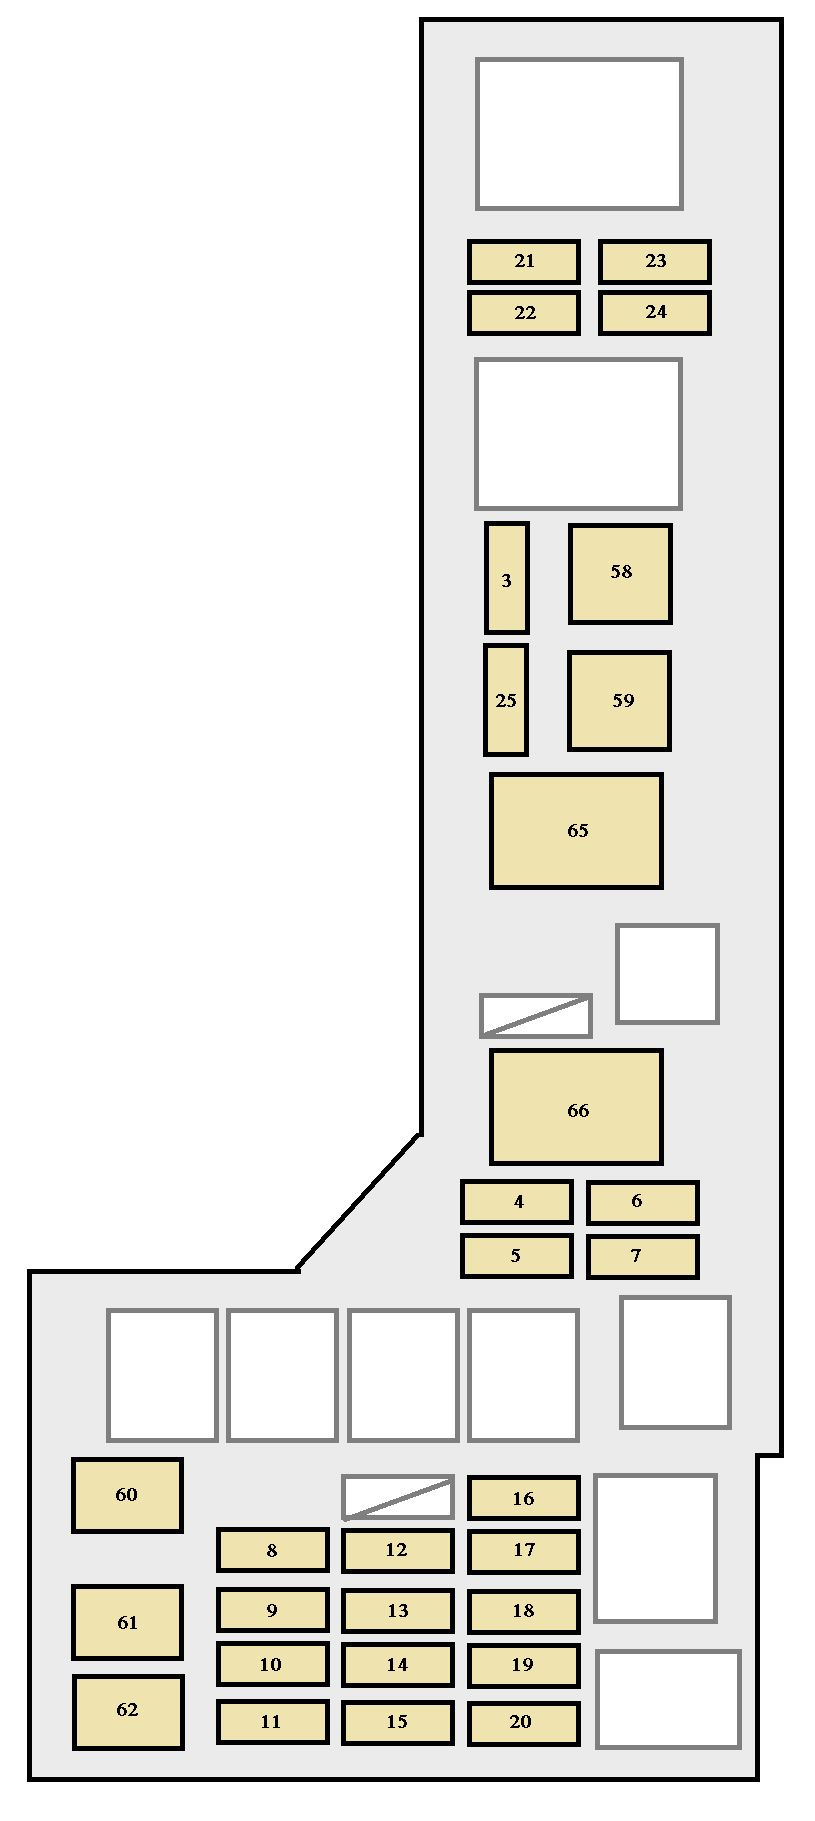 medium resolution of toyota avalon 2000 2002 fuse box diagram